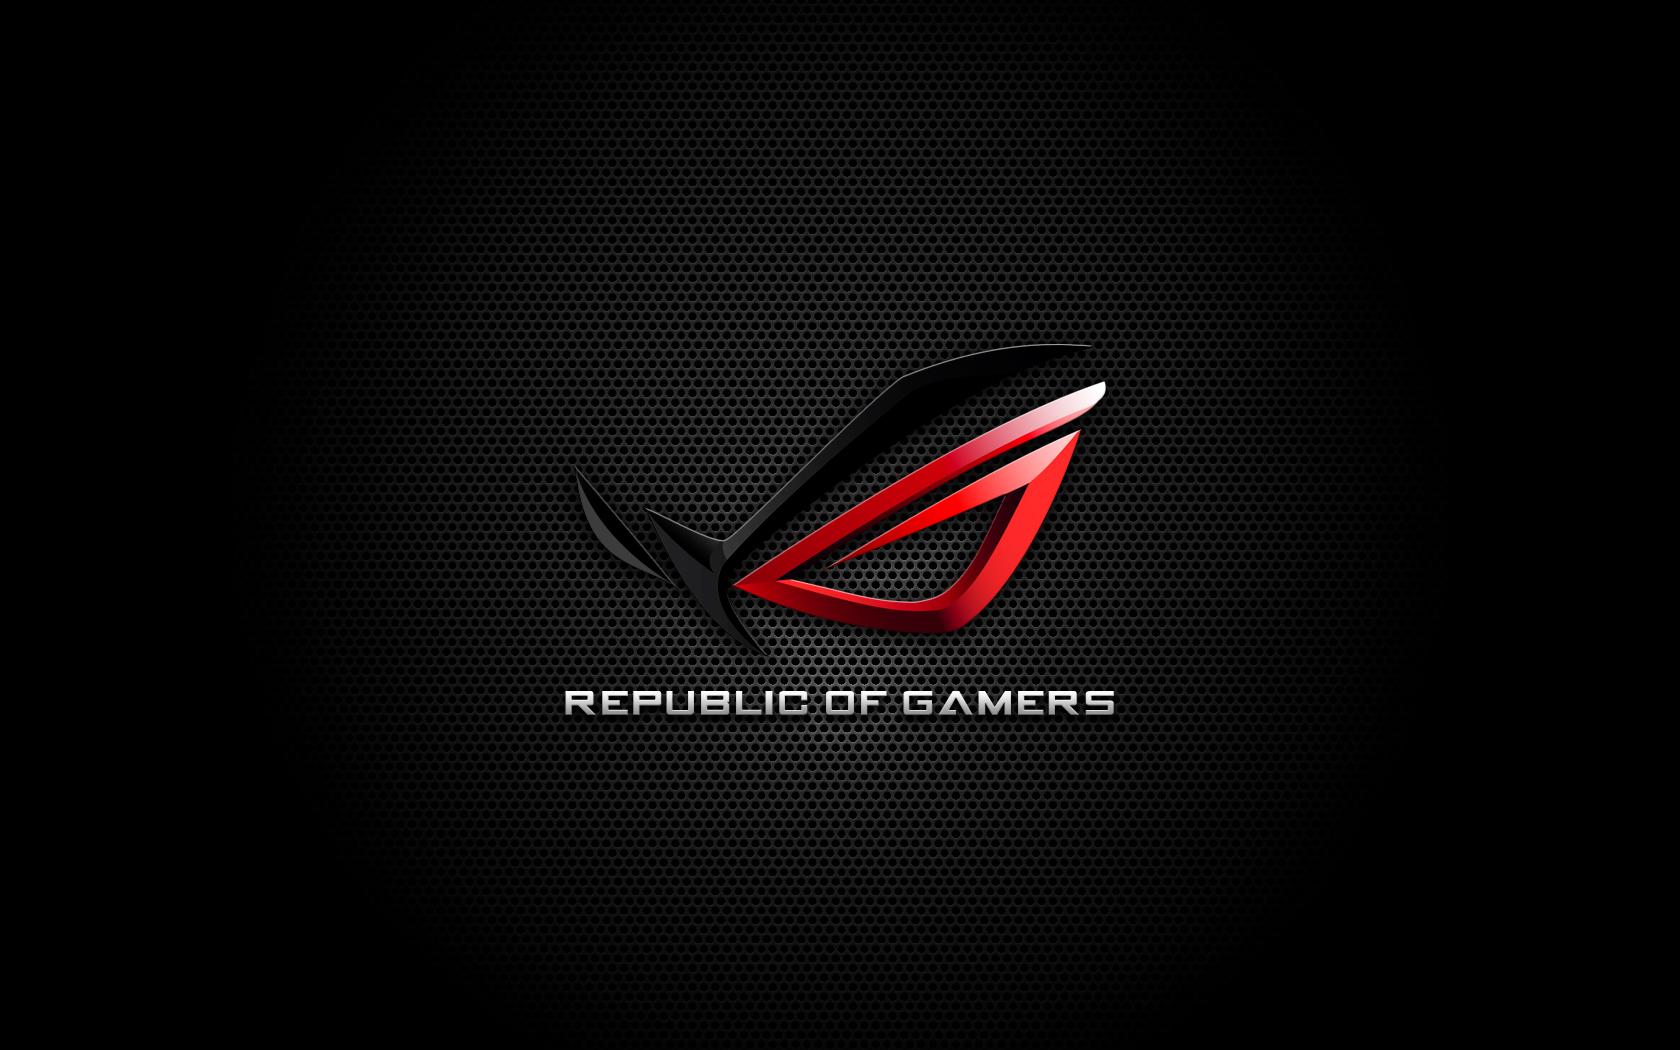 Download Republic Of Gamers Wallpaper 1680x1050